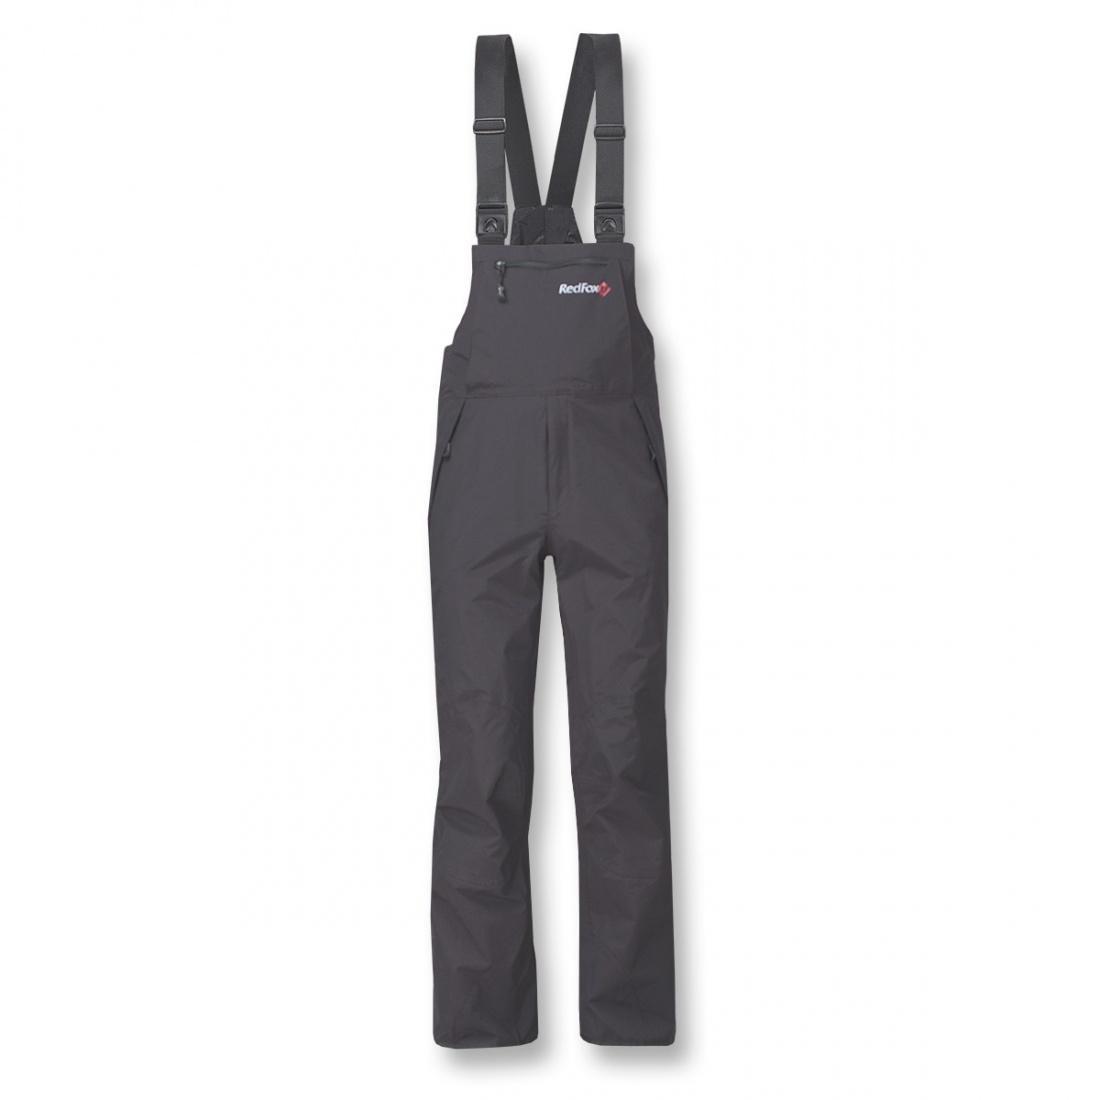 Брюки ветрозащитные Mont BlancБрюки, штаны<br><br><br>Цвет: Темно-серый<br>Размер: 56